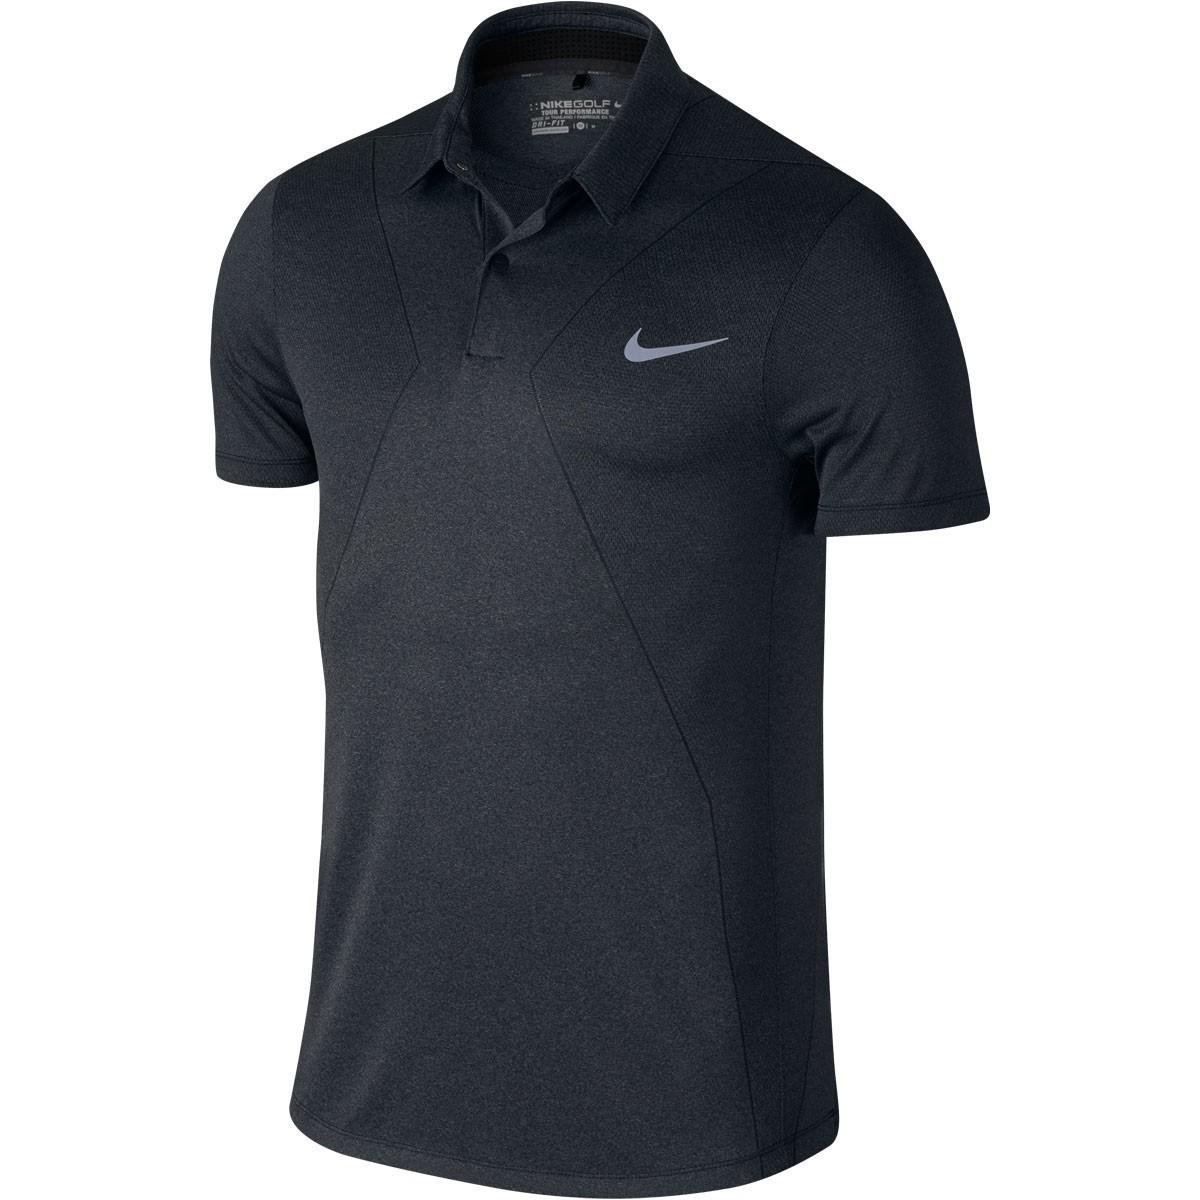 924f278d Nike Golf 2016 Mens MM Fly Swing Knit Frame Dri-FIT Golf Polo Shirt